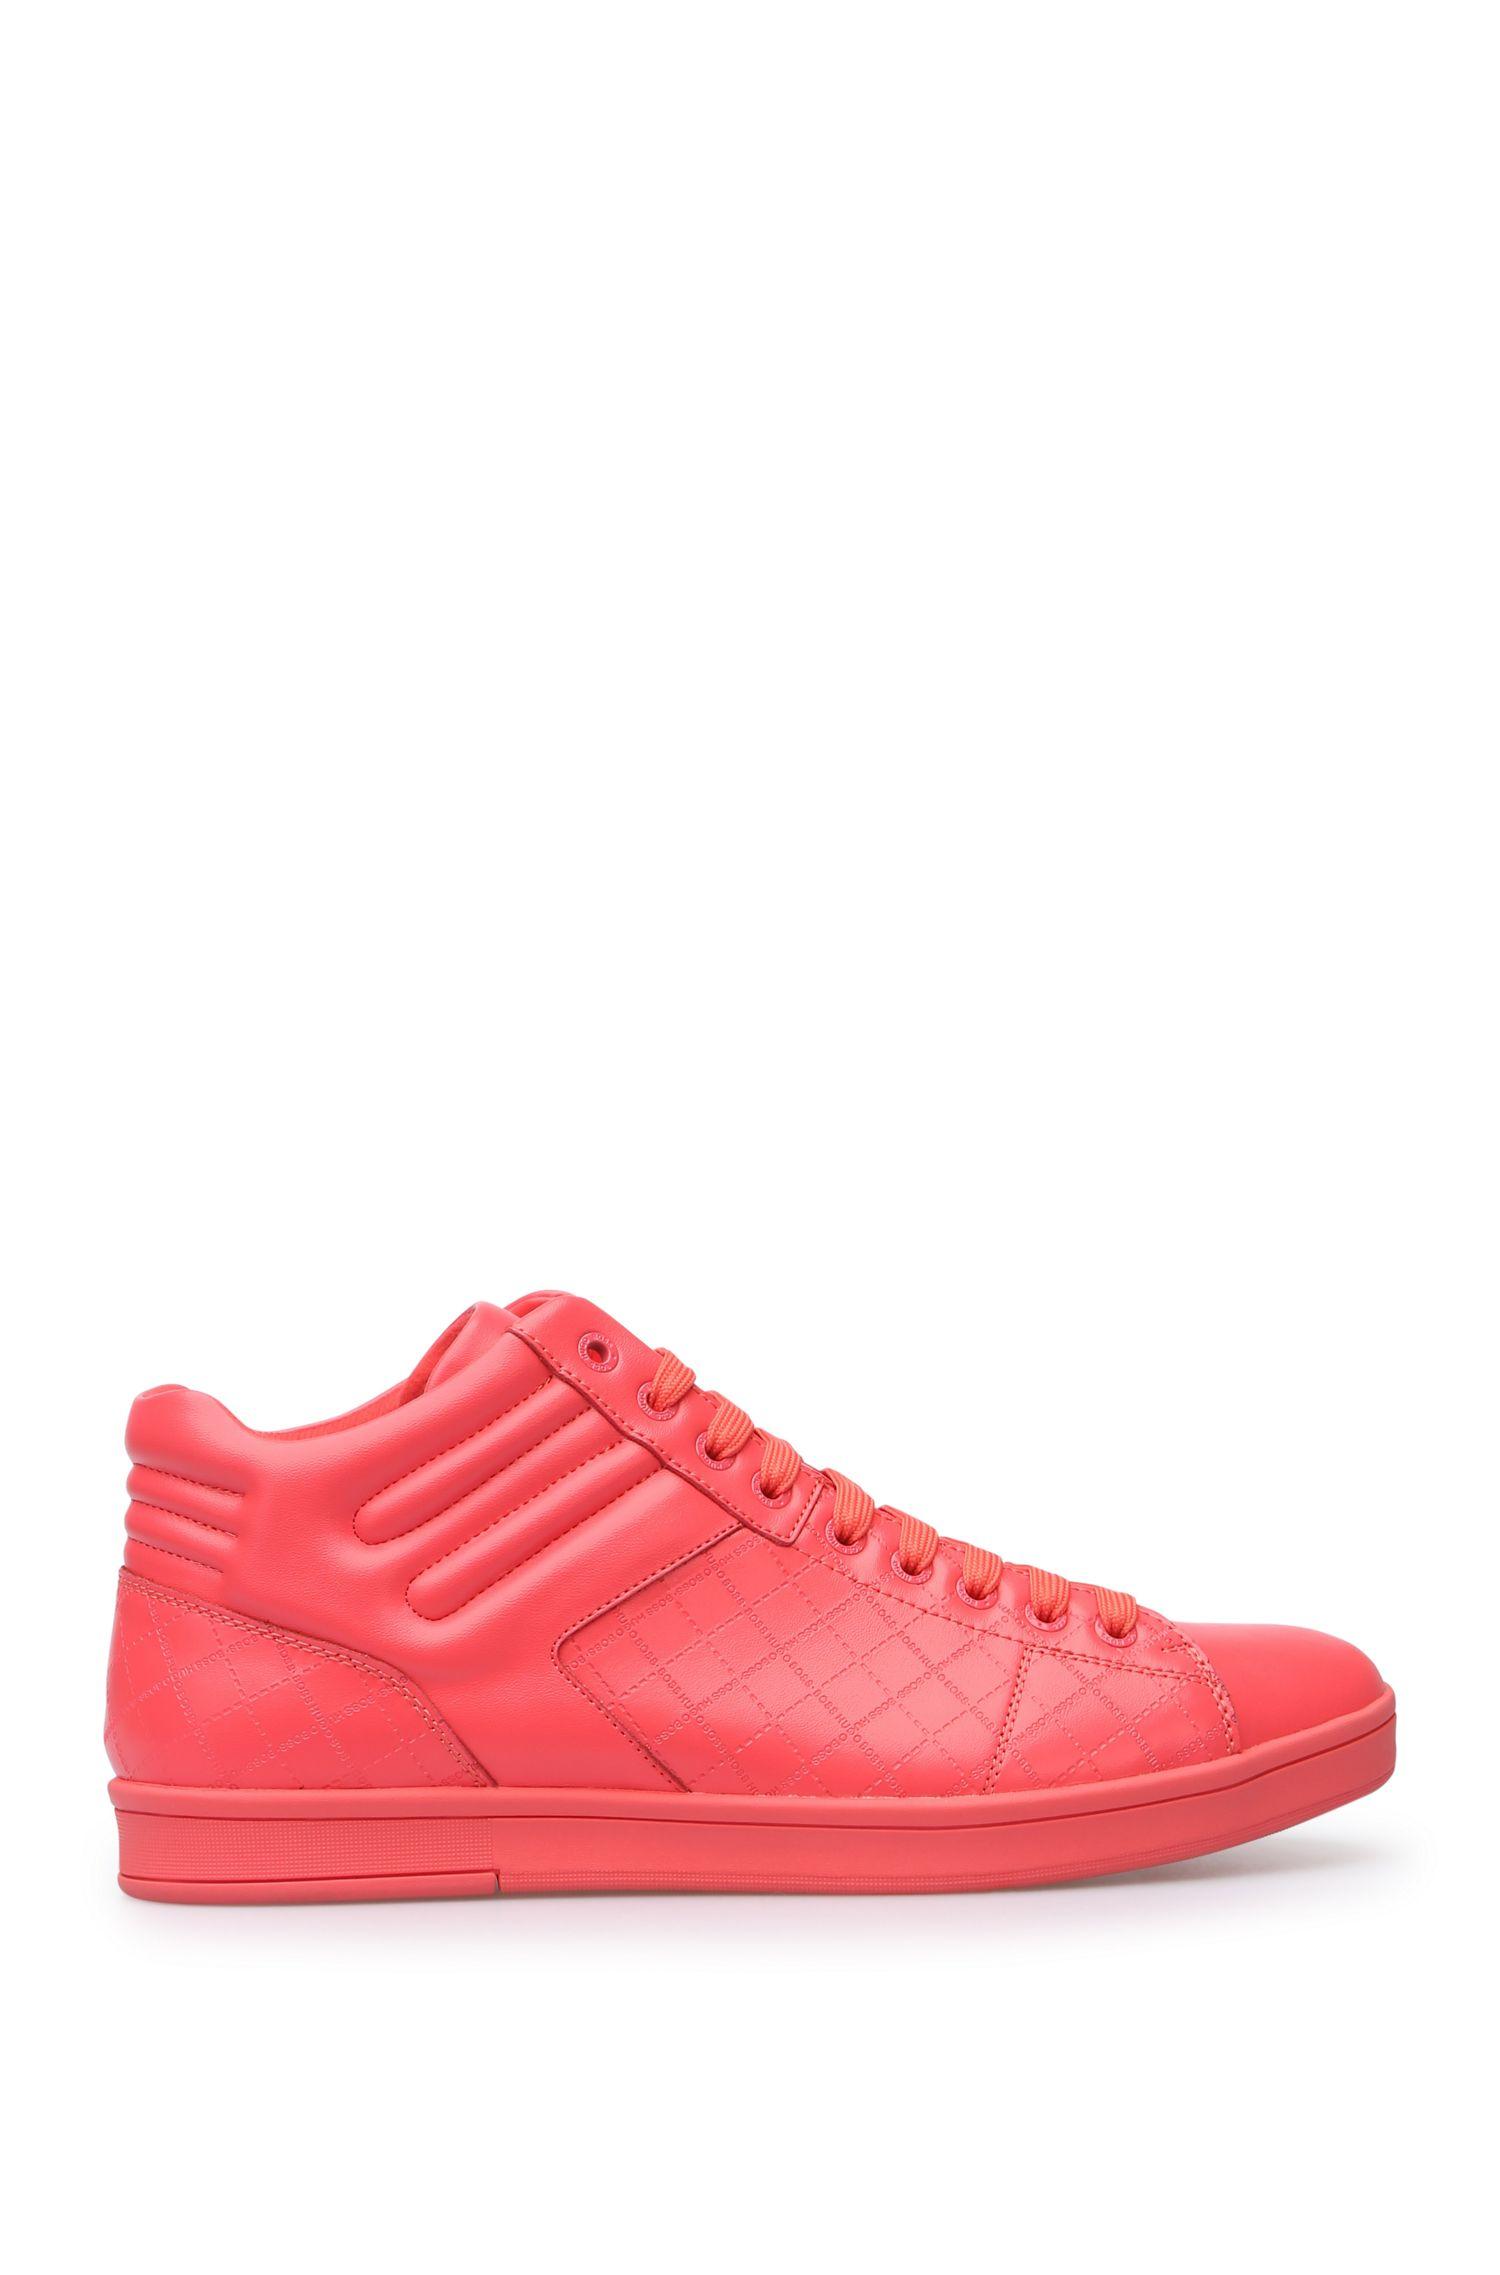 Lederne Sneakers mit Logo-Prägung: ´RayAdv_Midc_ltem`